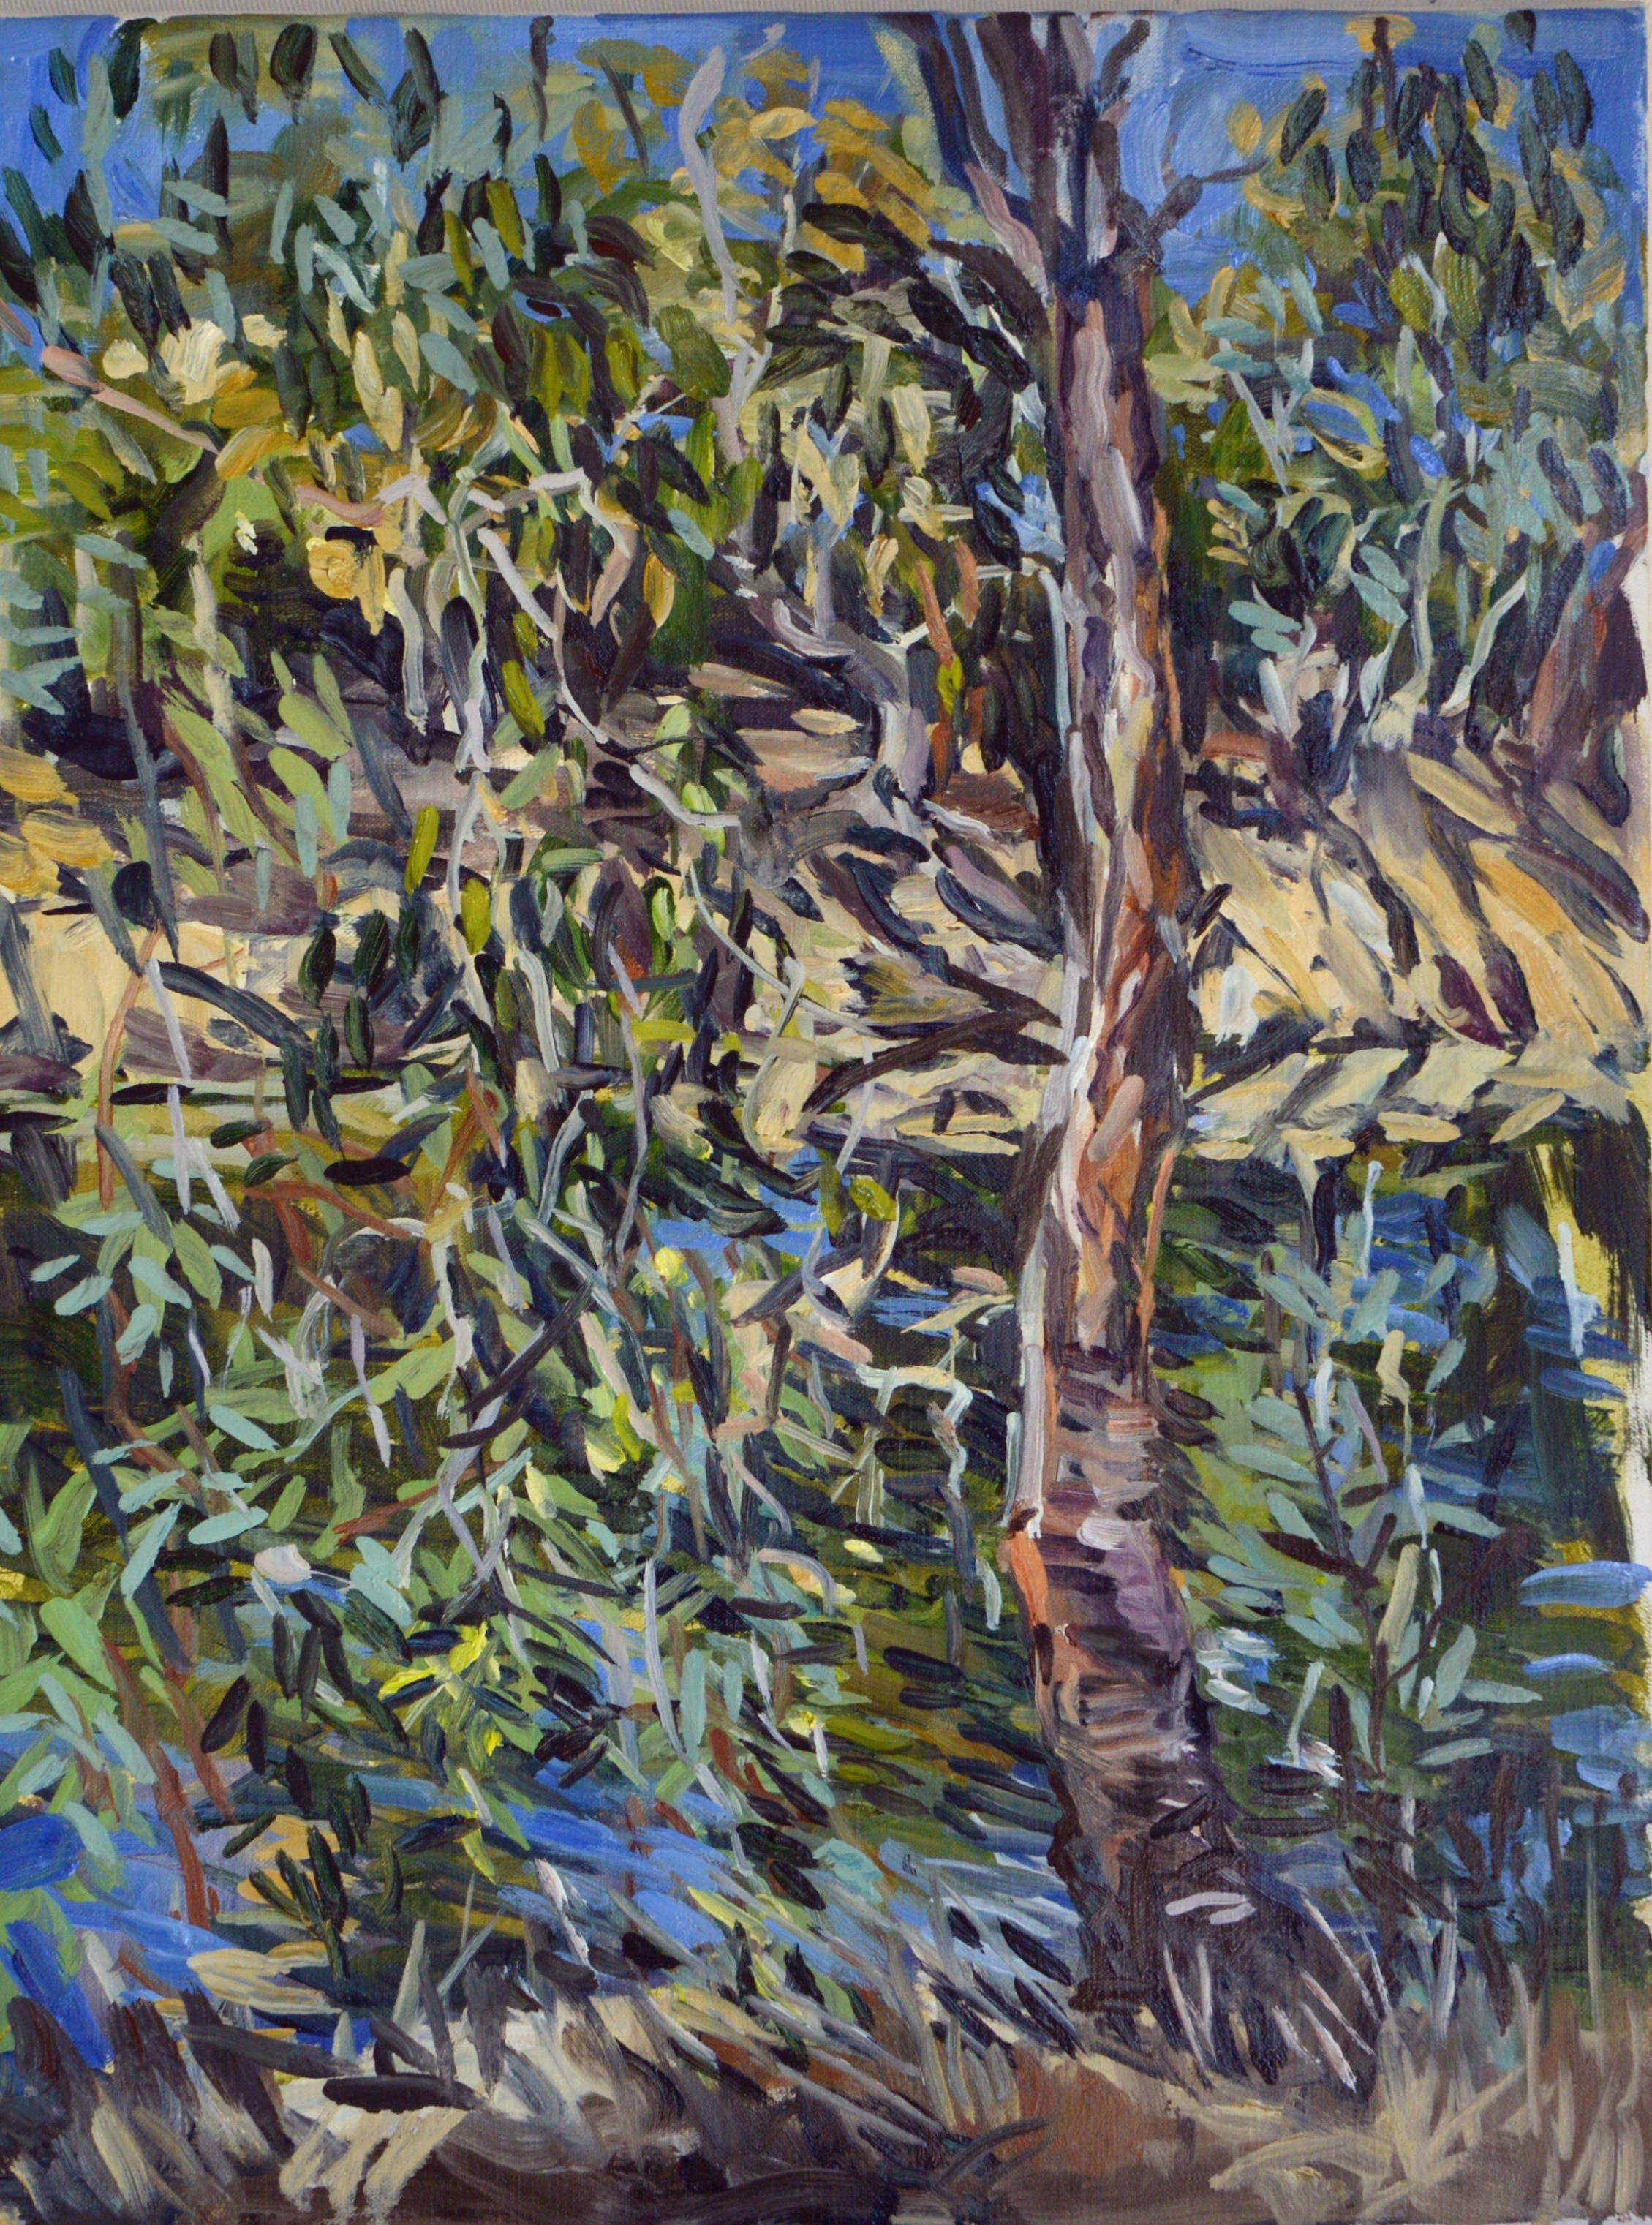 Young River Gum 2018 Oil on Belgian linen 60 x 45cm